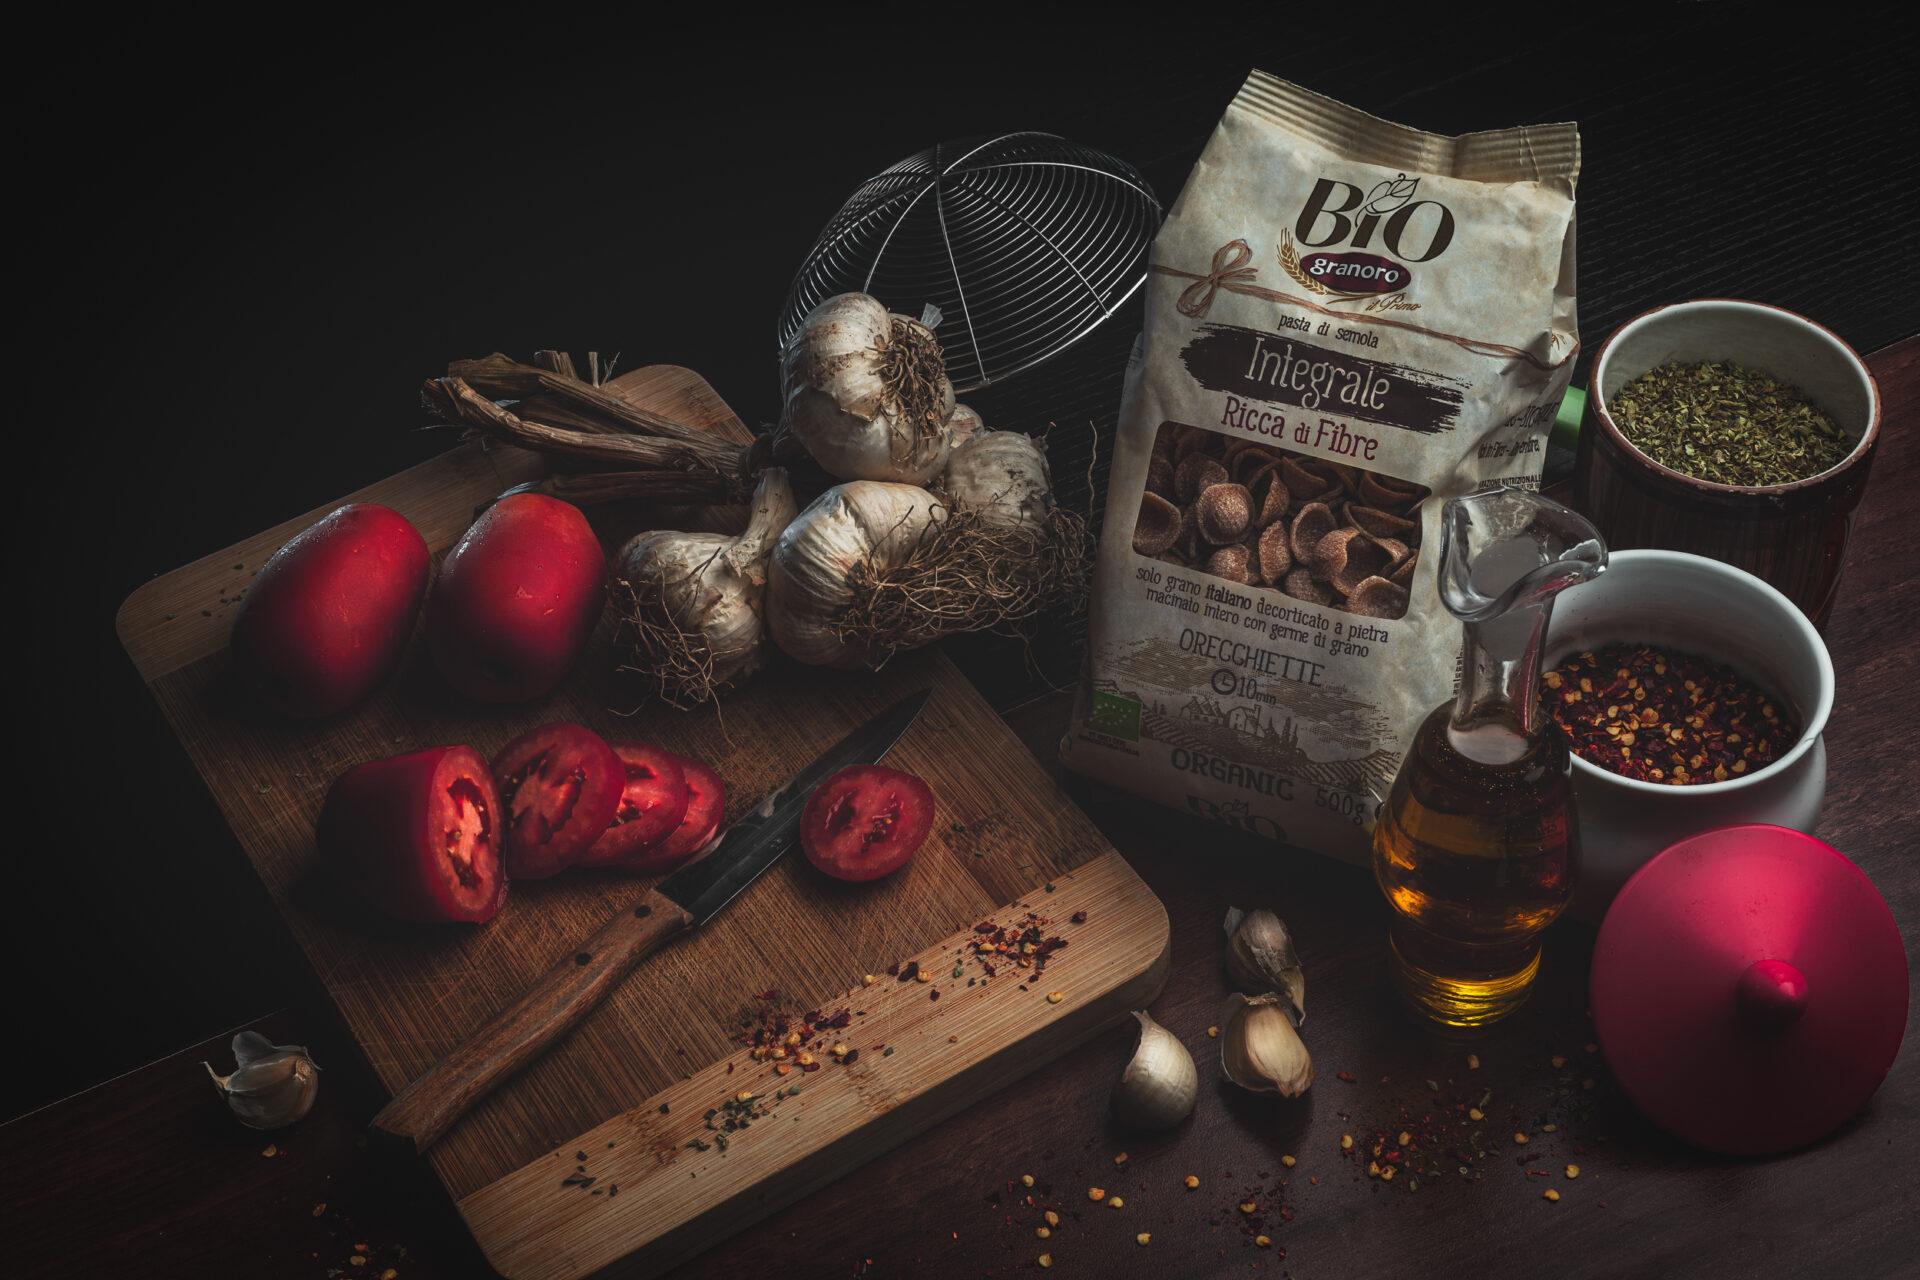 Still life granoro photo, pasta tomatoes garlic